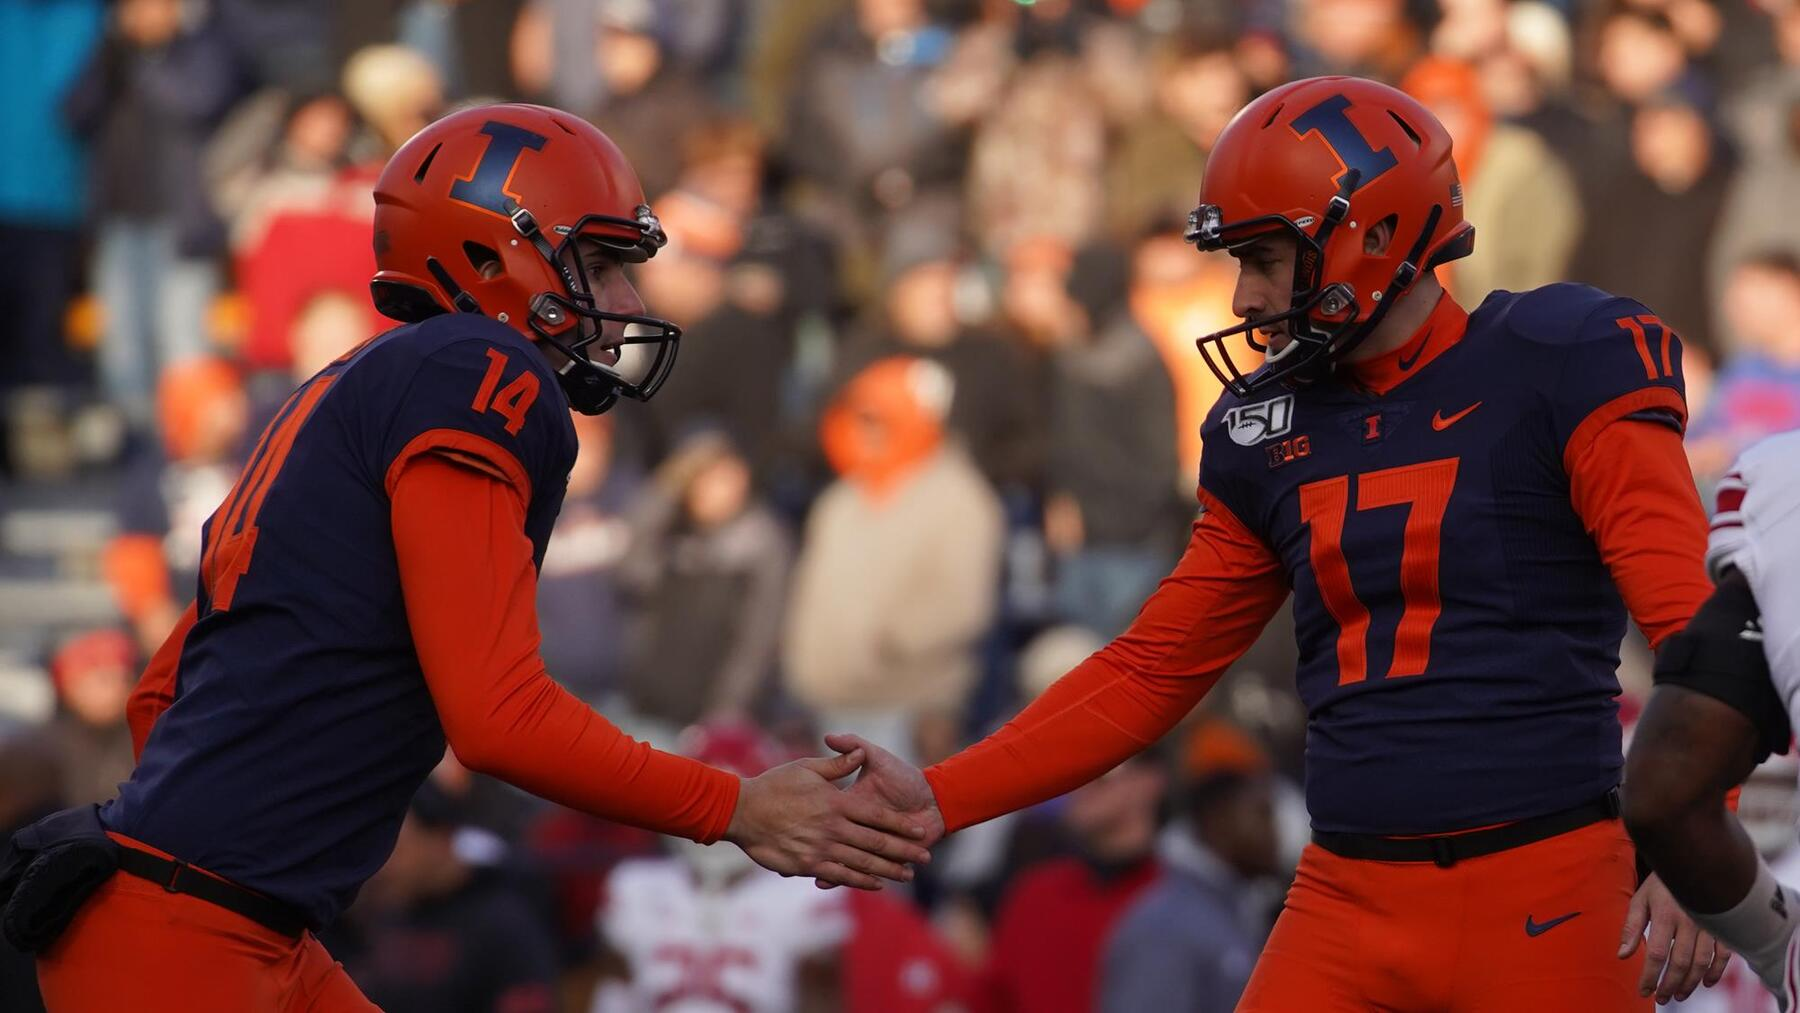 Illinois football's punter and kicker duo — Blake Hayes and James McCourt